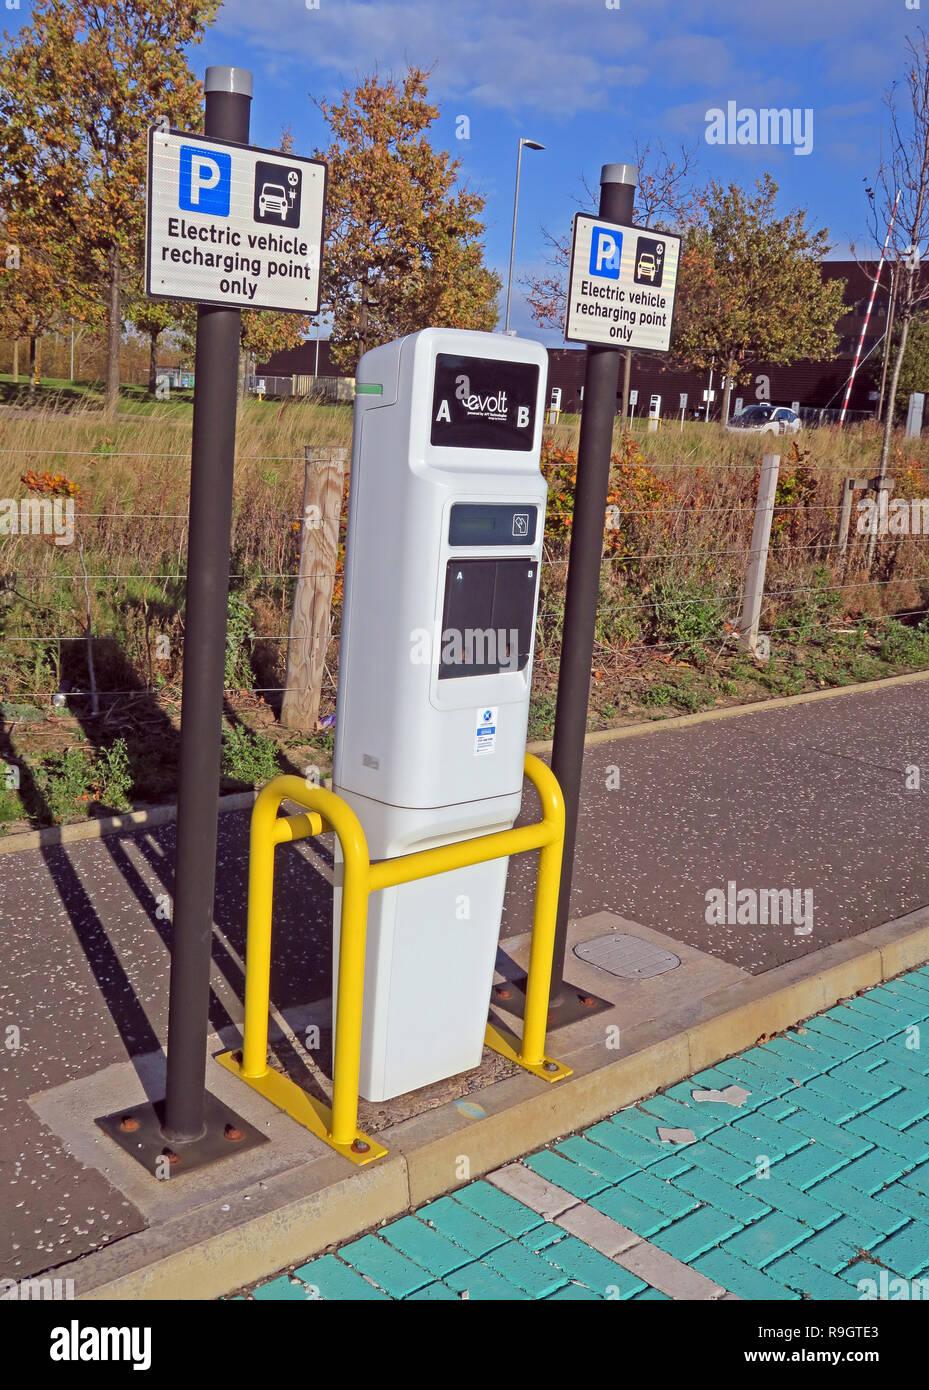 GoTonySmith,@HotpixUK,HotpixUK,charging point,Scotland,charging,point,low carbon,no carbon,vehicles,vehicle,Carbon Free,society,Recharging point only,Recharging point,only,sign,white,yellow,Eskbank,Dalkeith,Midlothian,UK,EV,charging points,EV Charging,grant,ChargePoint,free,charge,electric vehicle charging points,electric vehicle charging network,green,motion,Electric vehicle (EV) charging,types,Eskbank Railway Station,college,Edinburgh College (Midlothian Campus),rapid